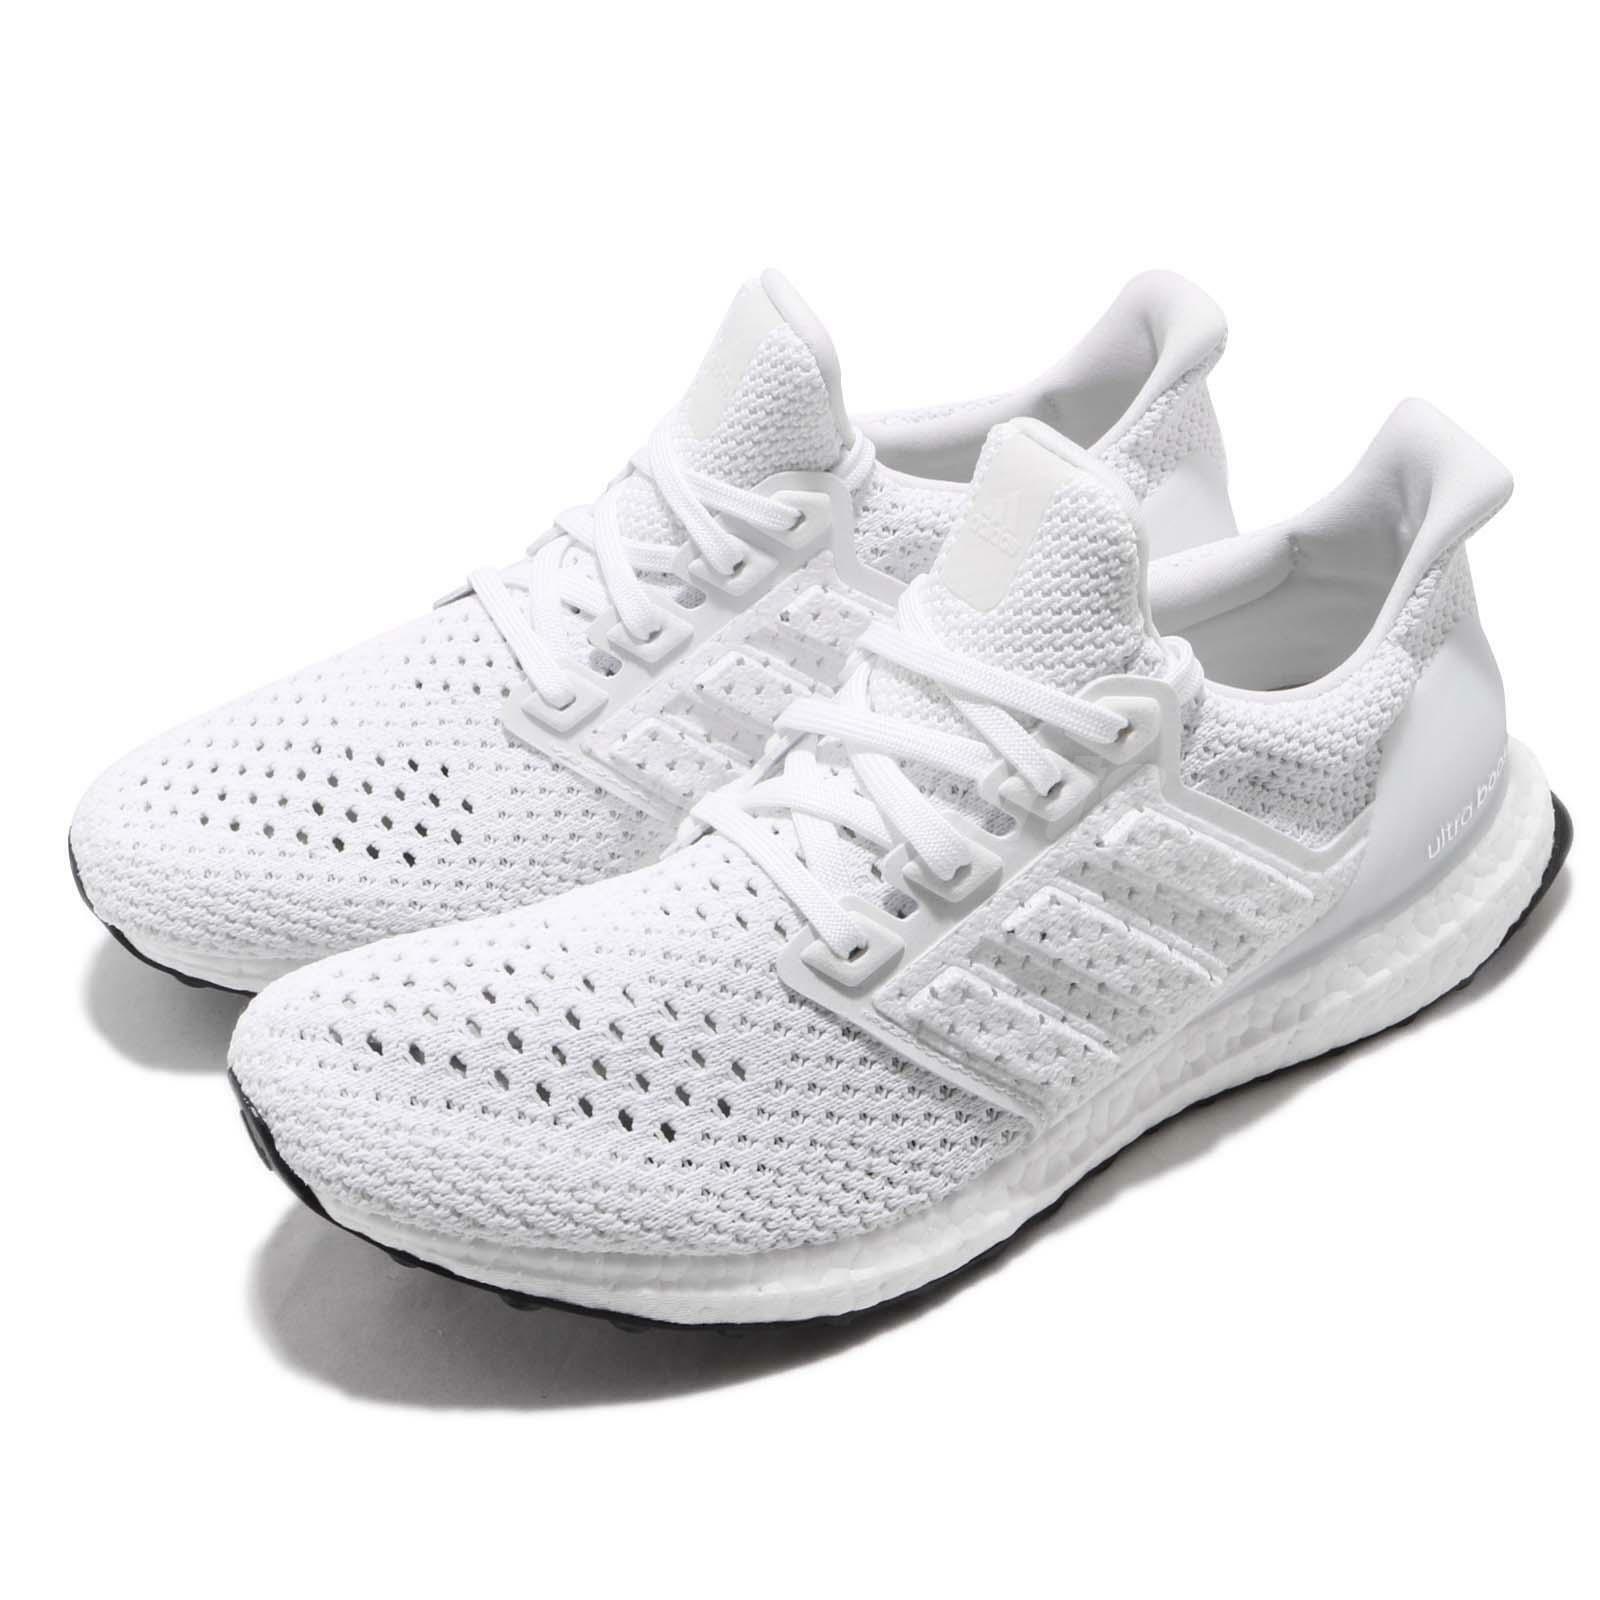 Adidas UltraBOOST Clima blanc argent Men Running Training chaussures baskets CG7082